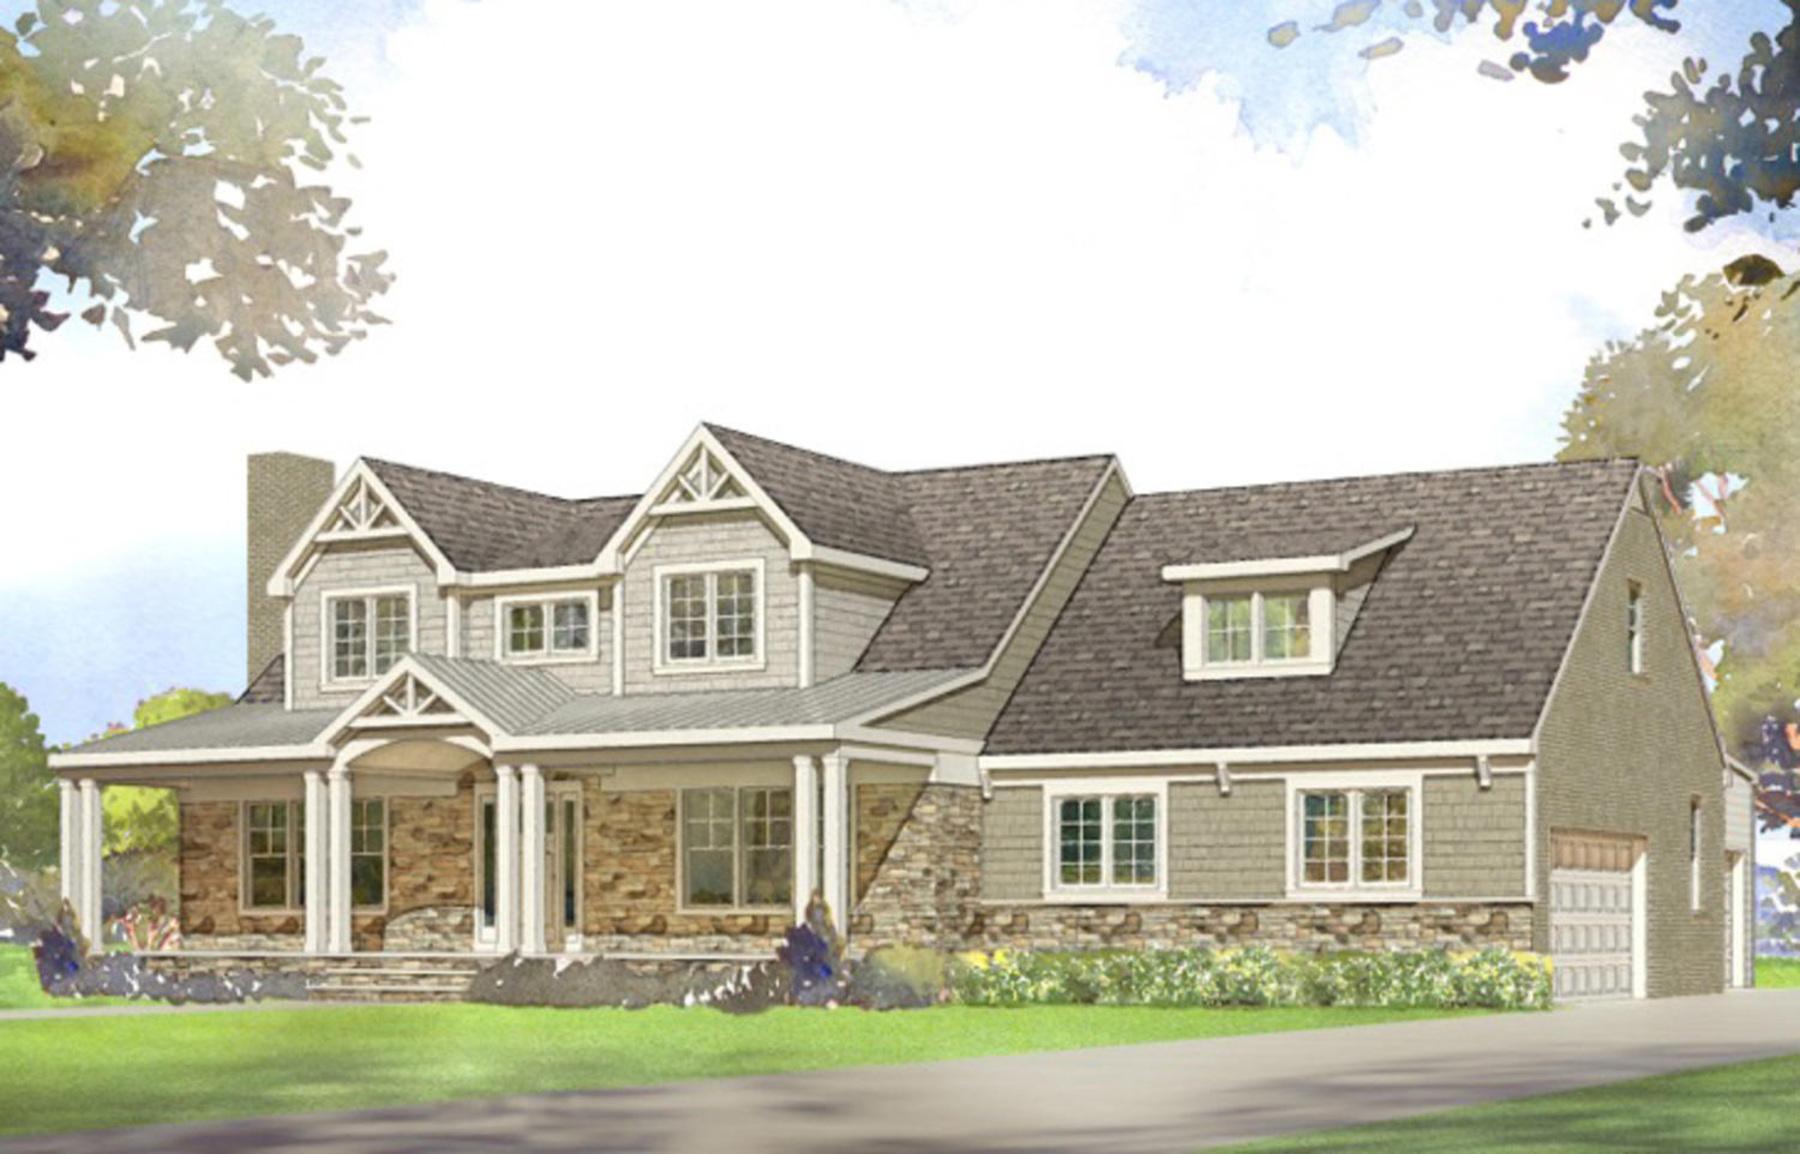 Single Family Home for Sale at 1306 Janneys Lane, Alexandria 1306 Janneys Ln Alexandria, Virginia 22302 United States